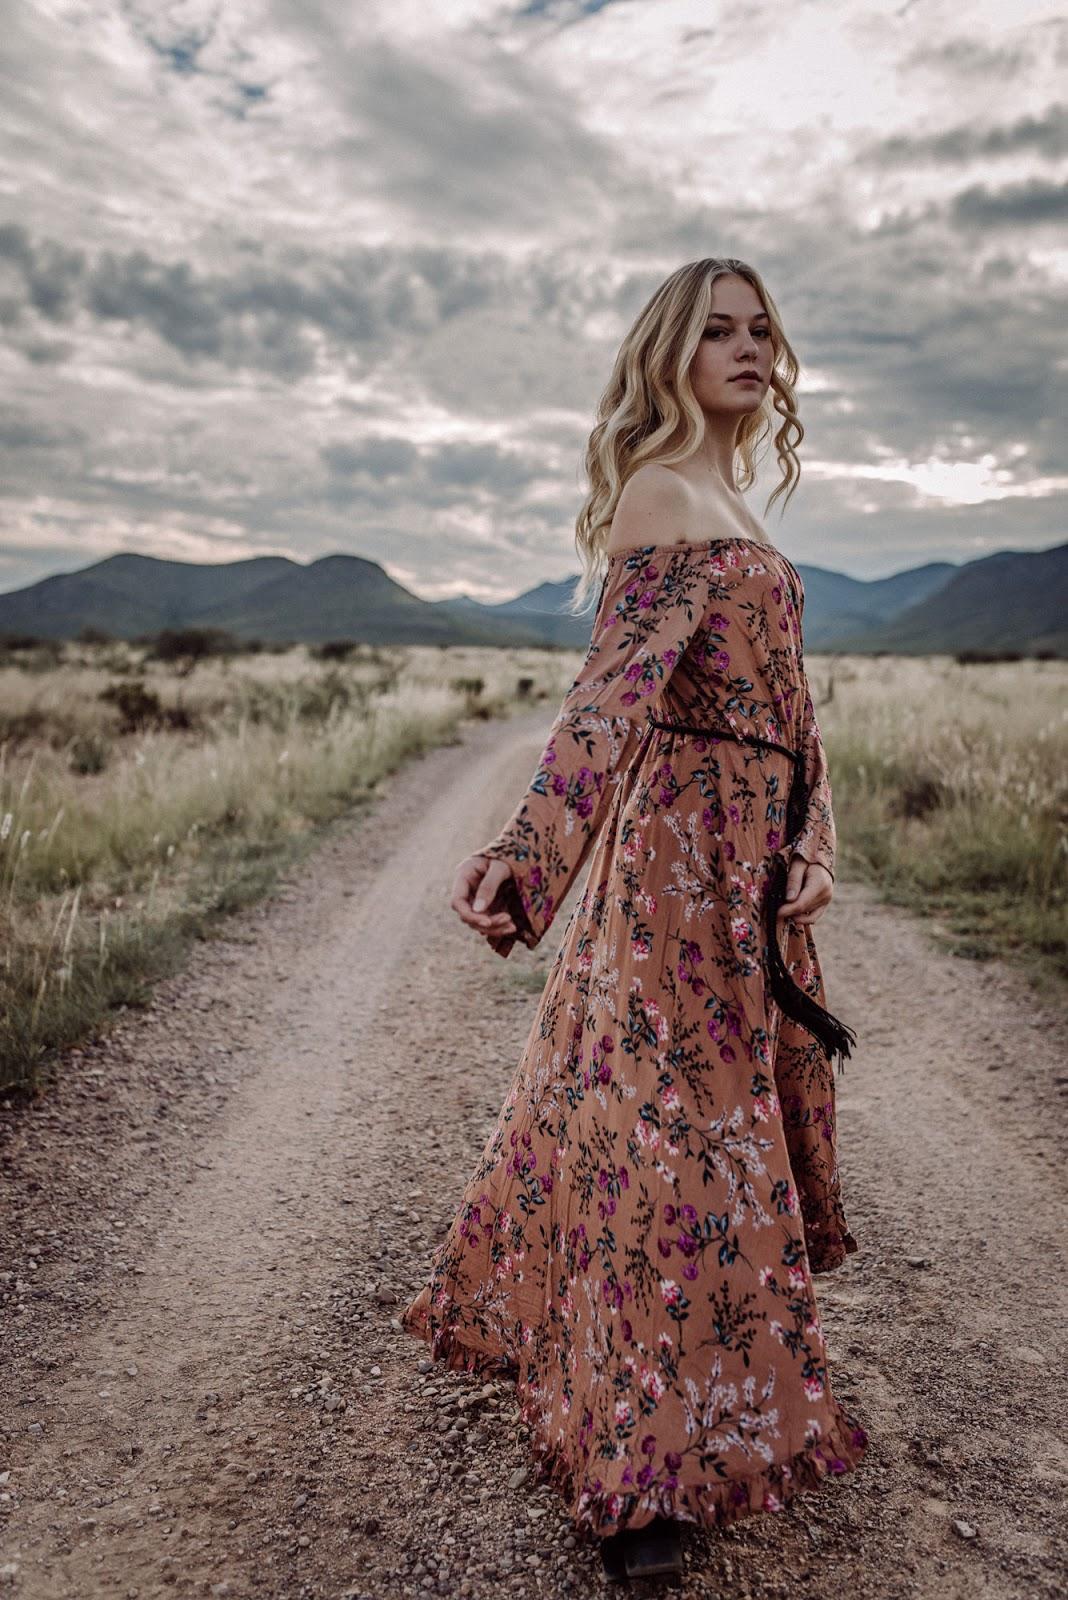 Preset Tone Màu Moody Mờ Mang Phong Cách Âu Mỹ – Wanderlust Collection –  EmbraceNation (LR)